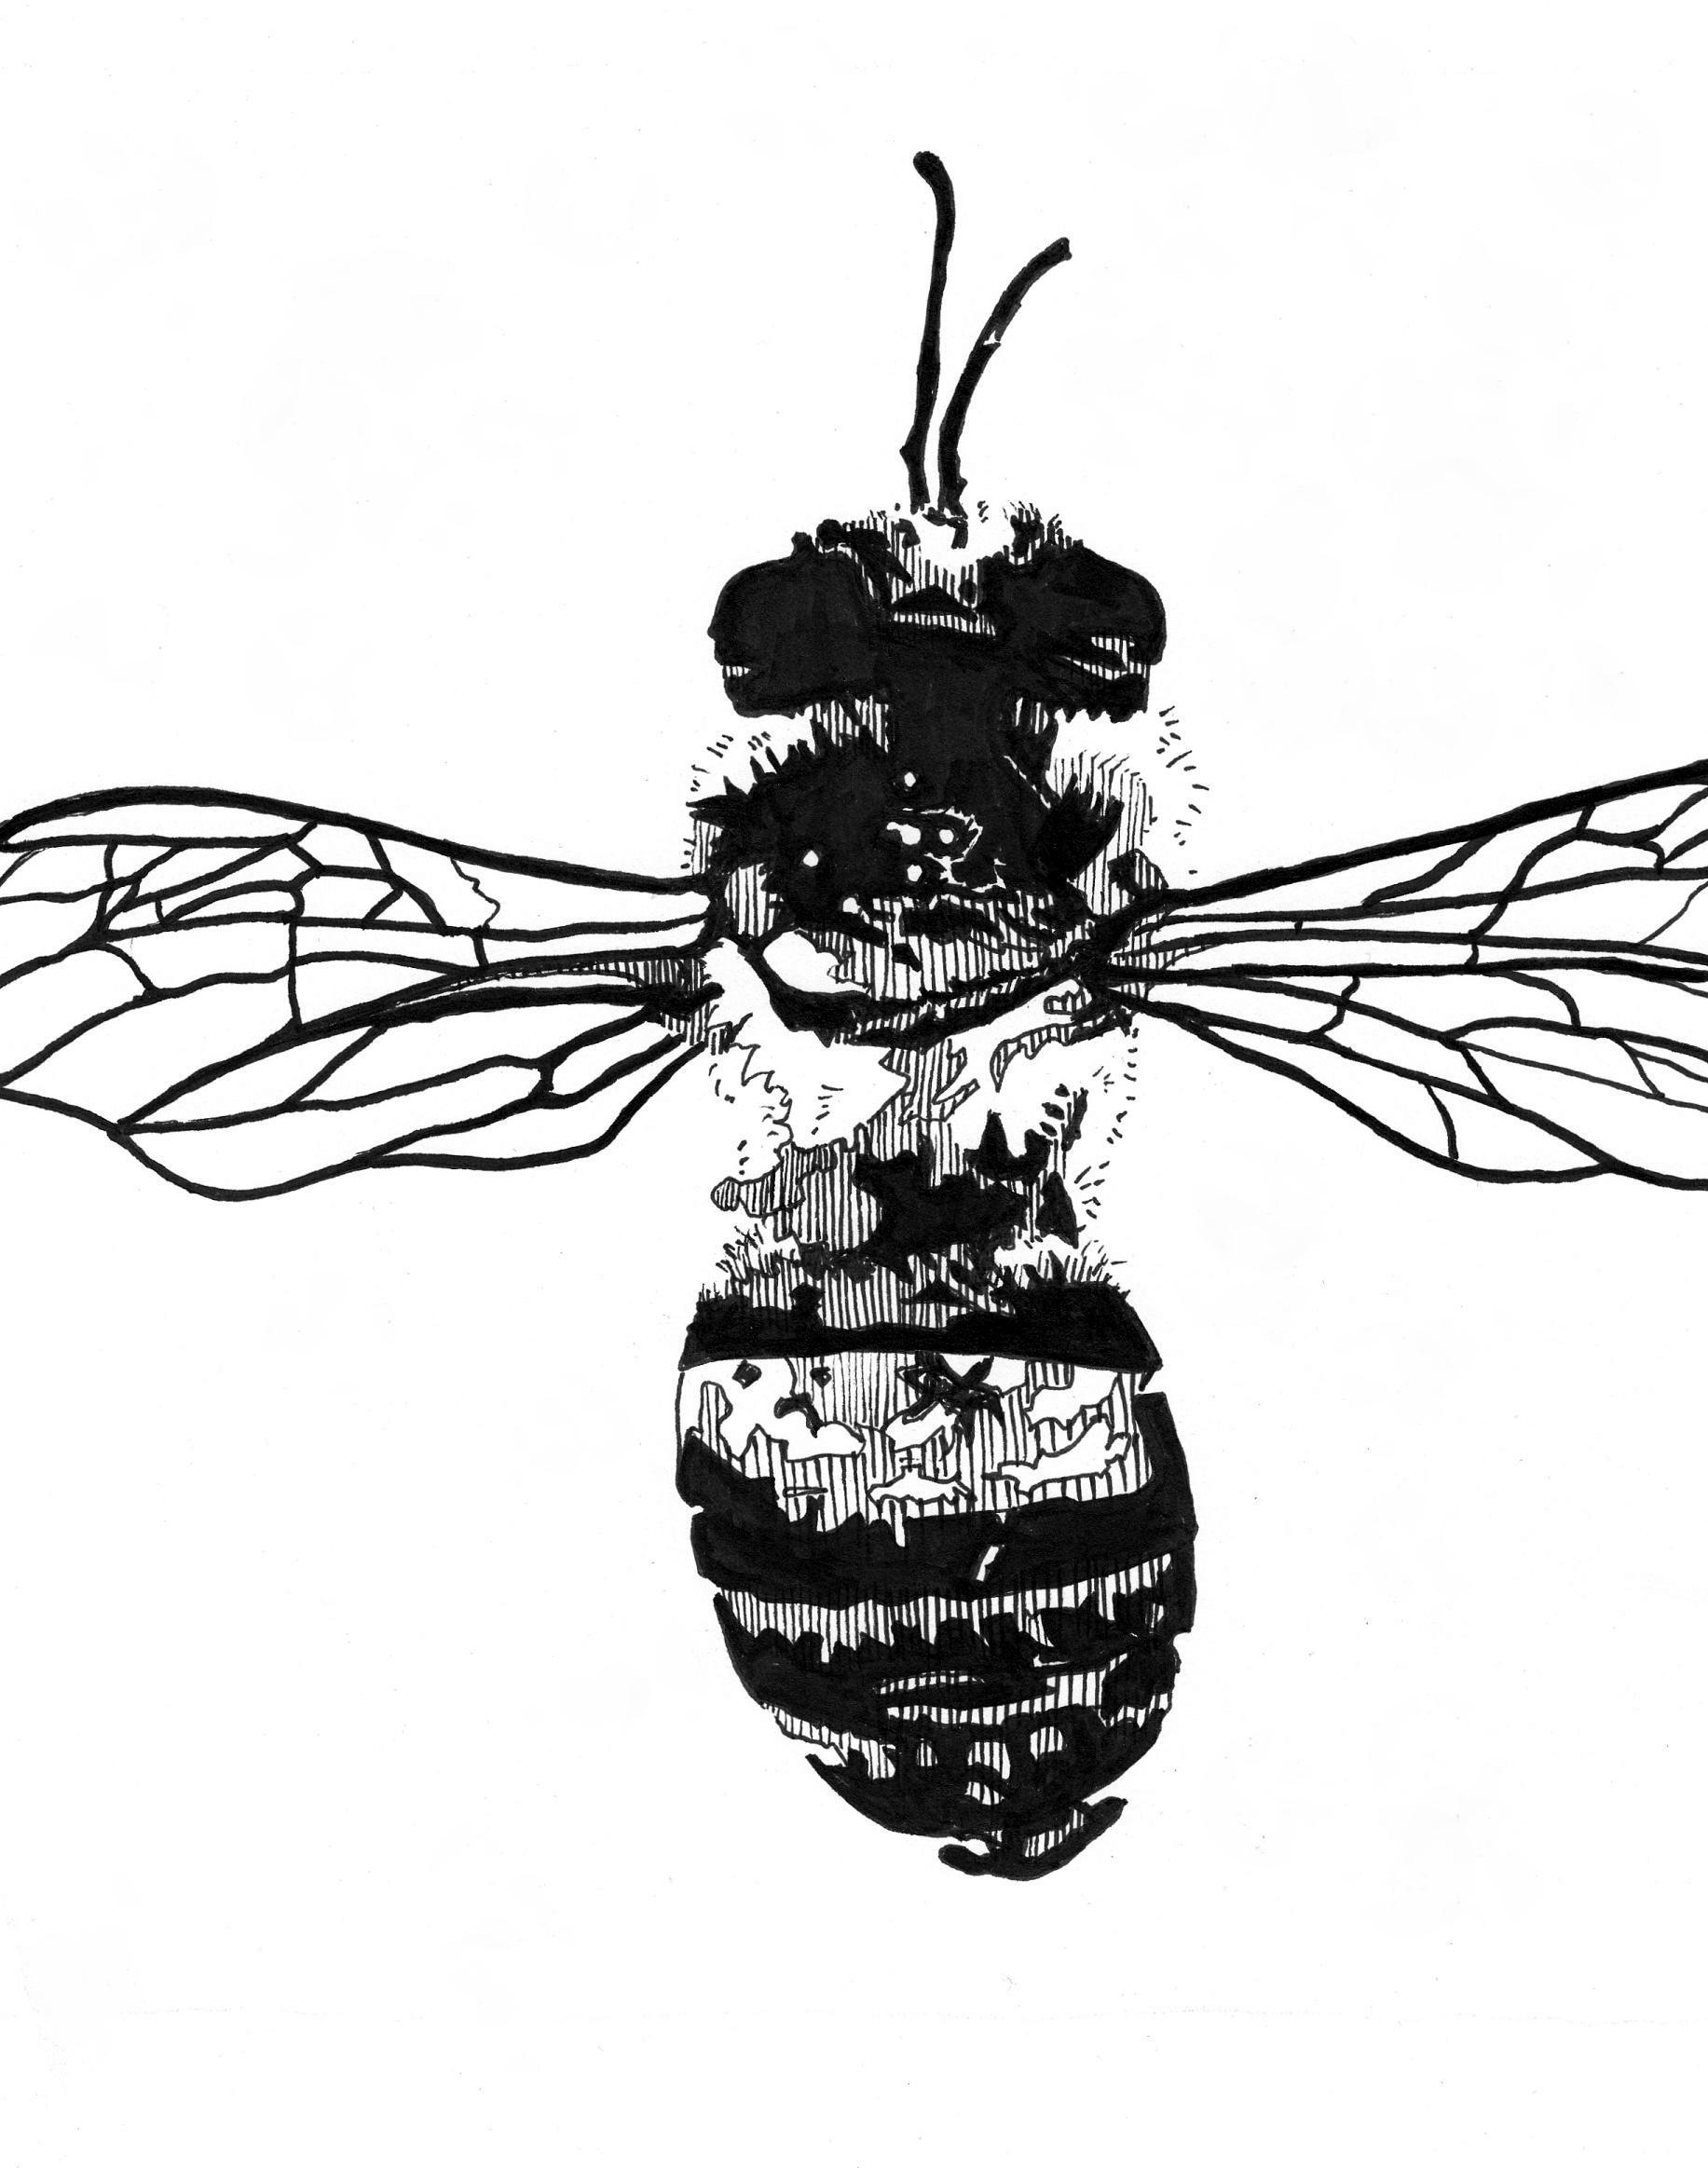 bee ink drawing - Copy